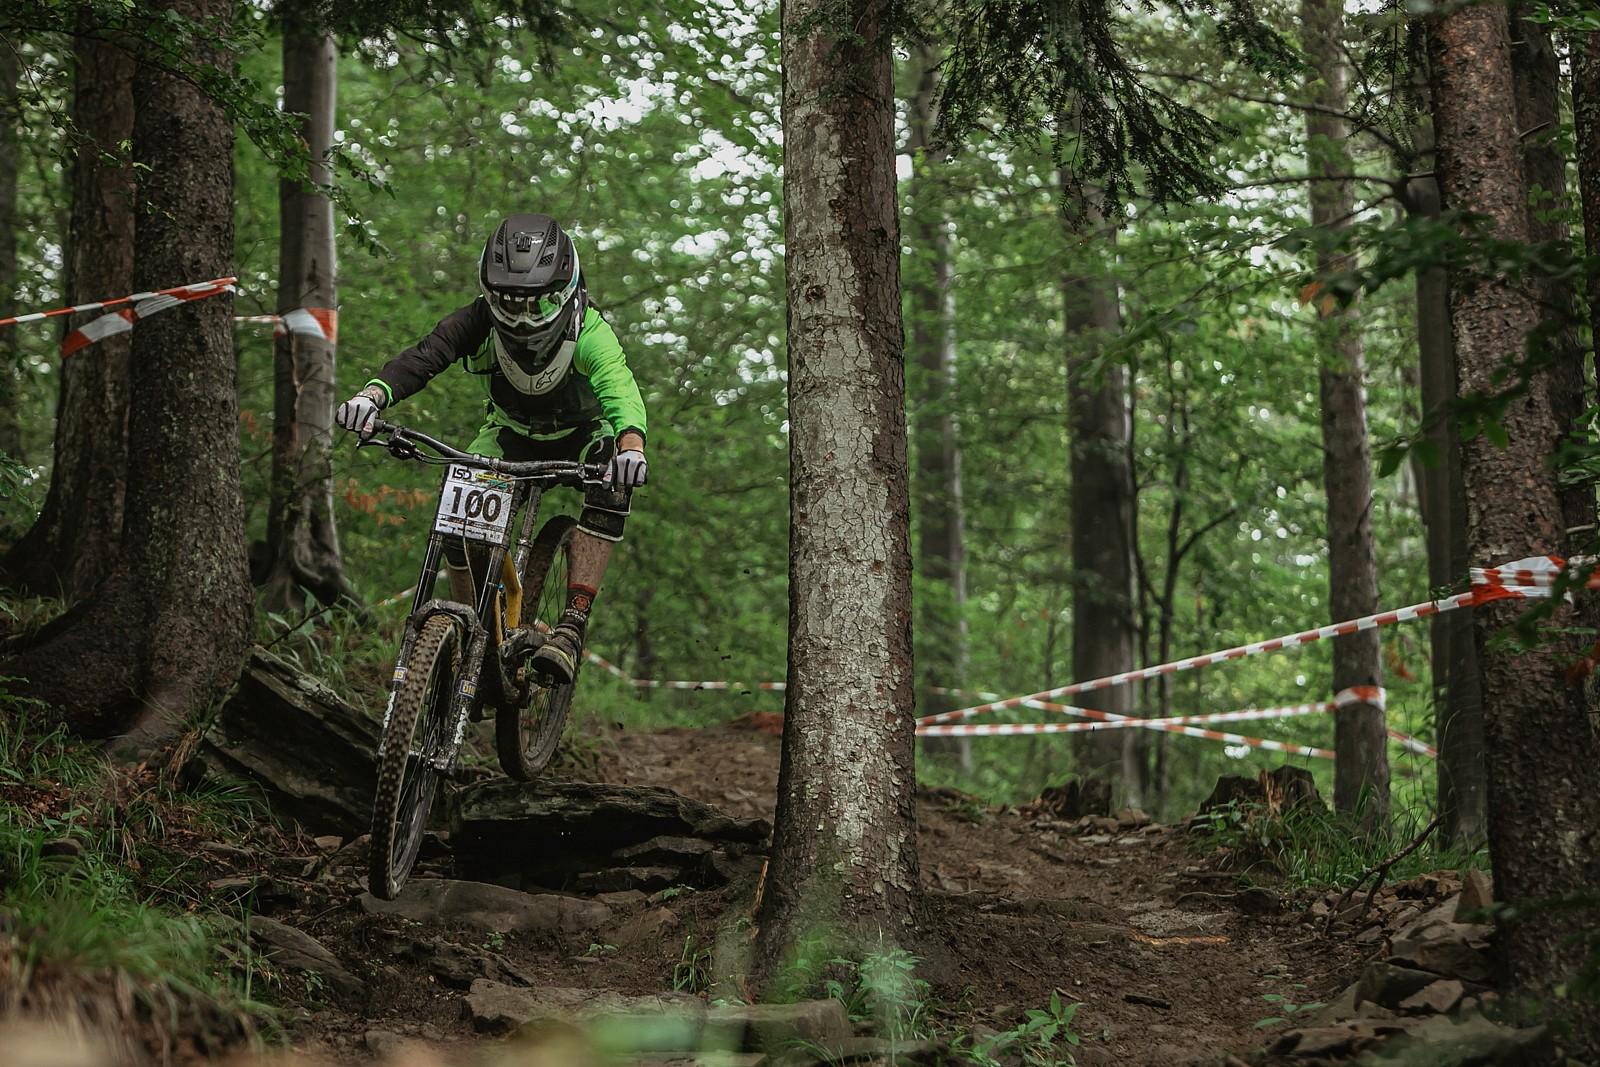 Local Series of Downhill Zawoja 2 - bartek_zgr - Mountain Biking Pictures - Vital MTB